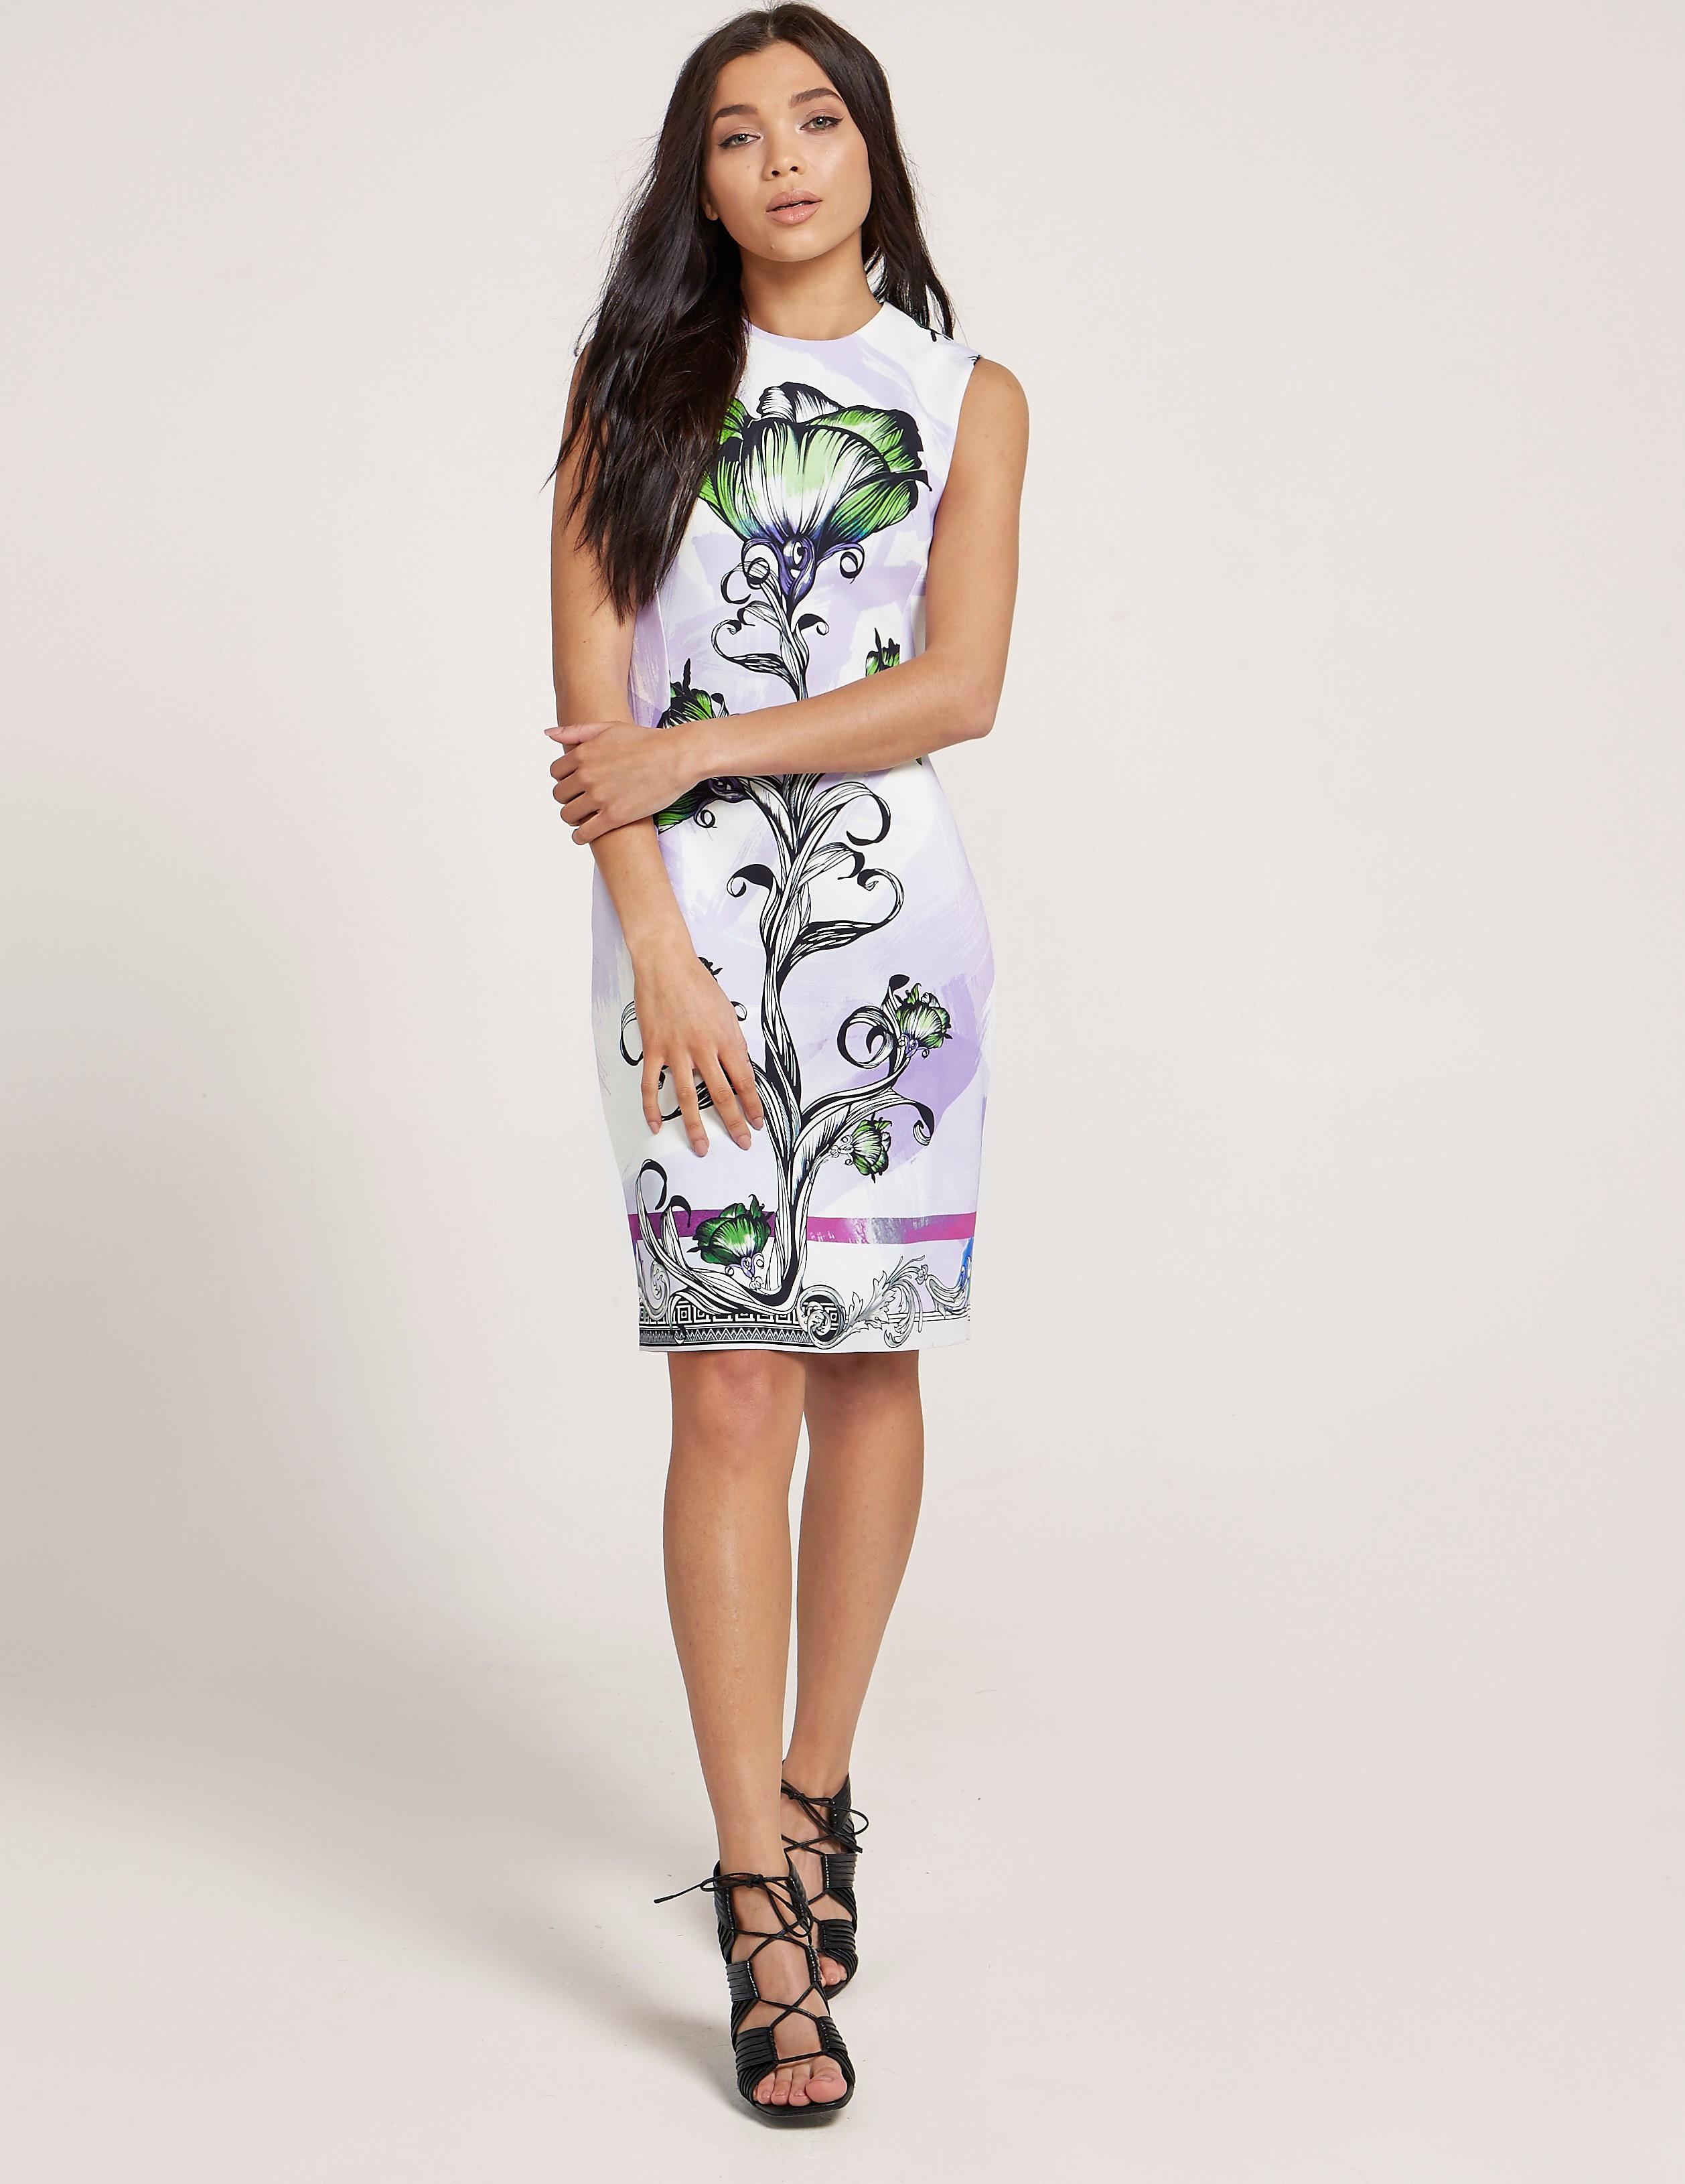 Versus Versace Print Dress